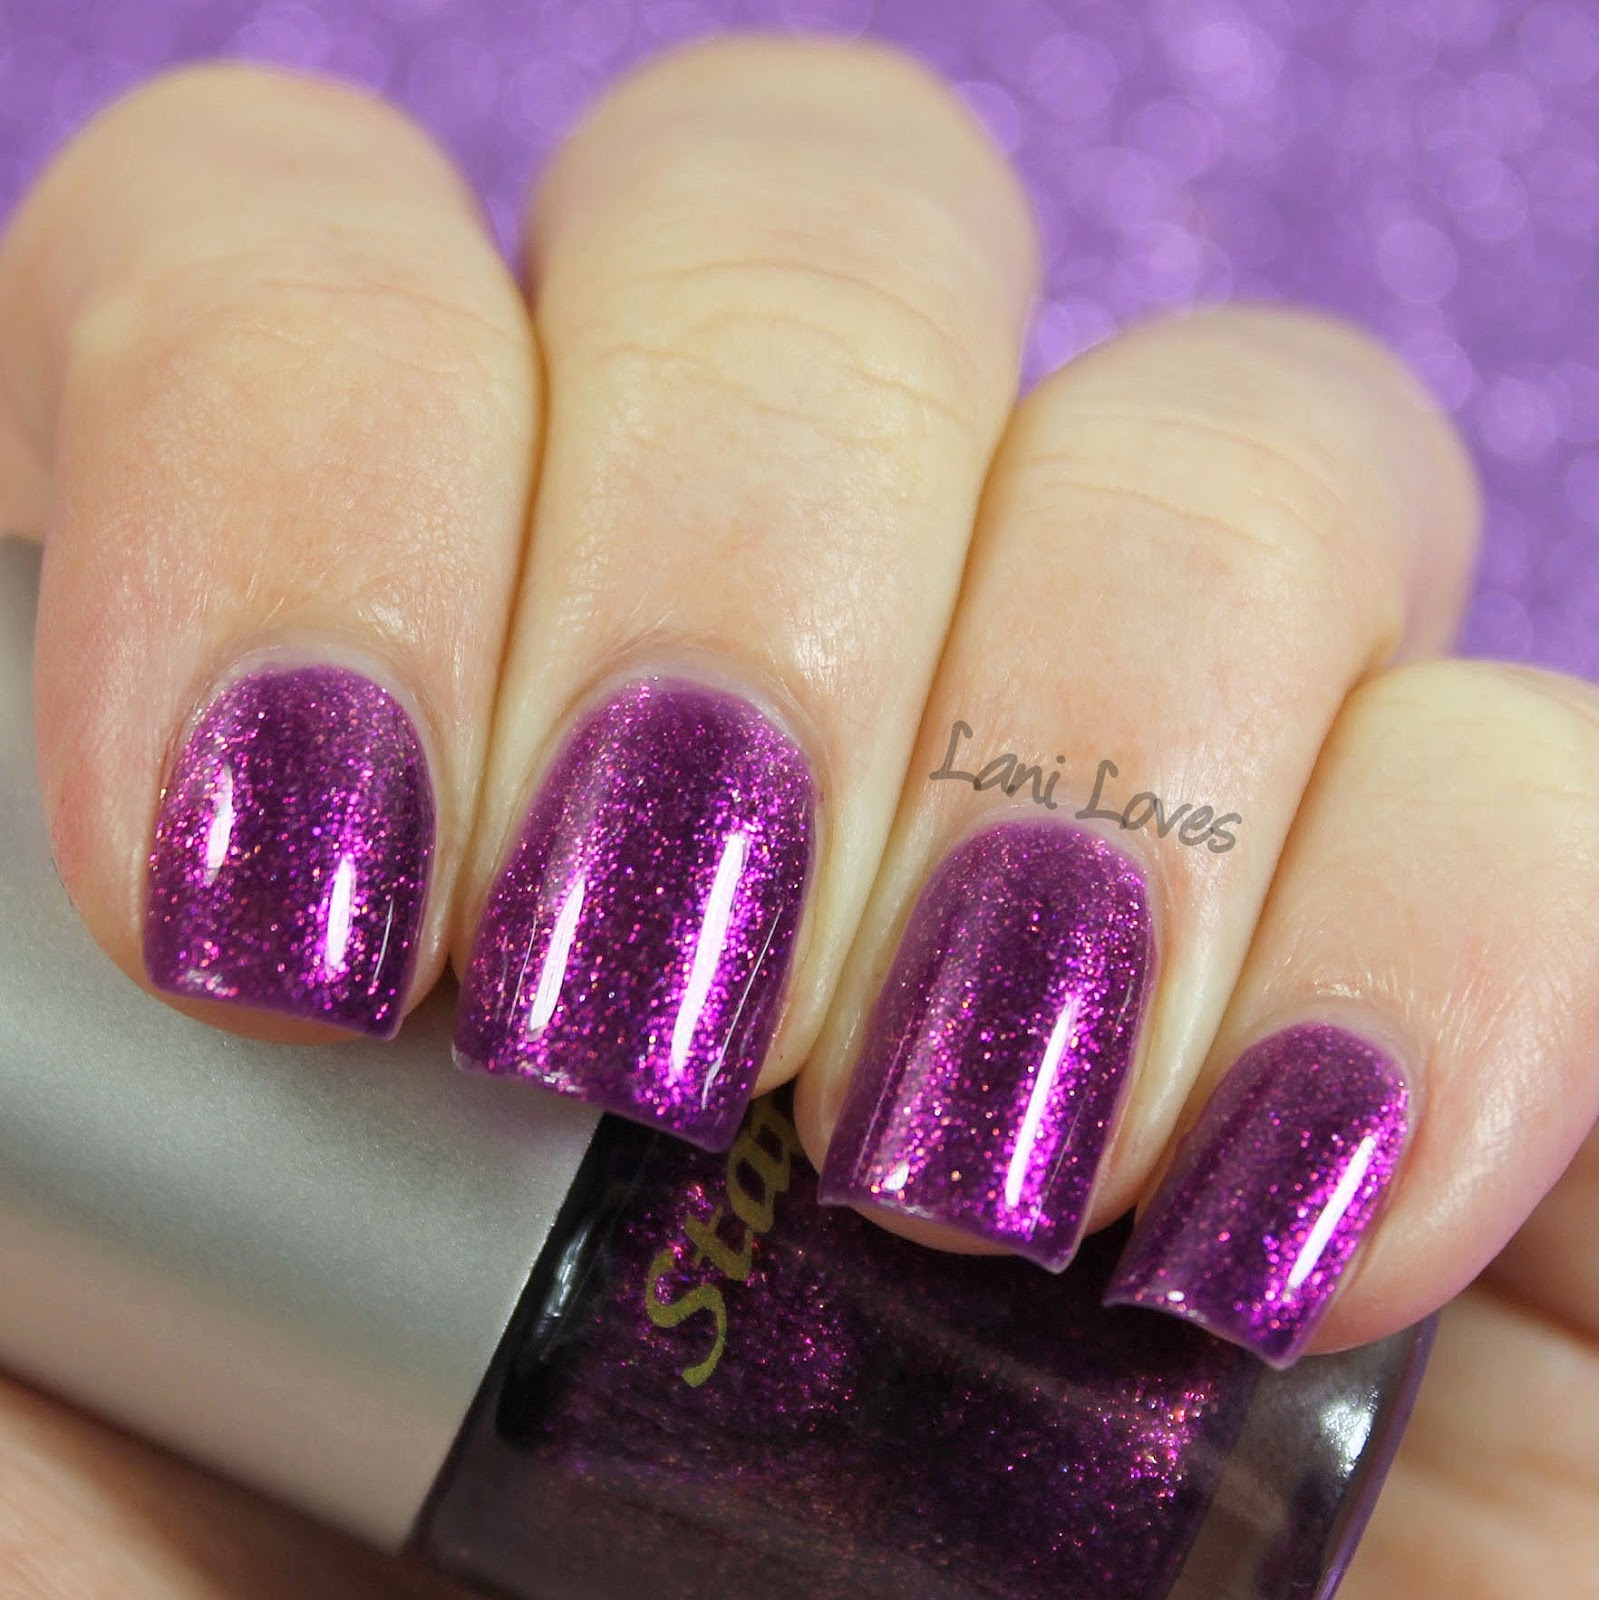 Star Kin Thparkly nail polish swatch